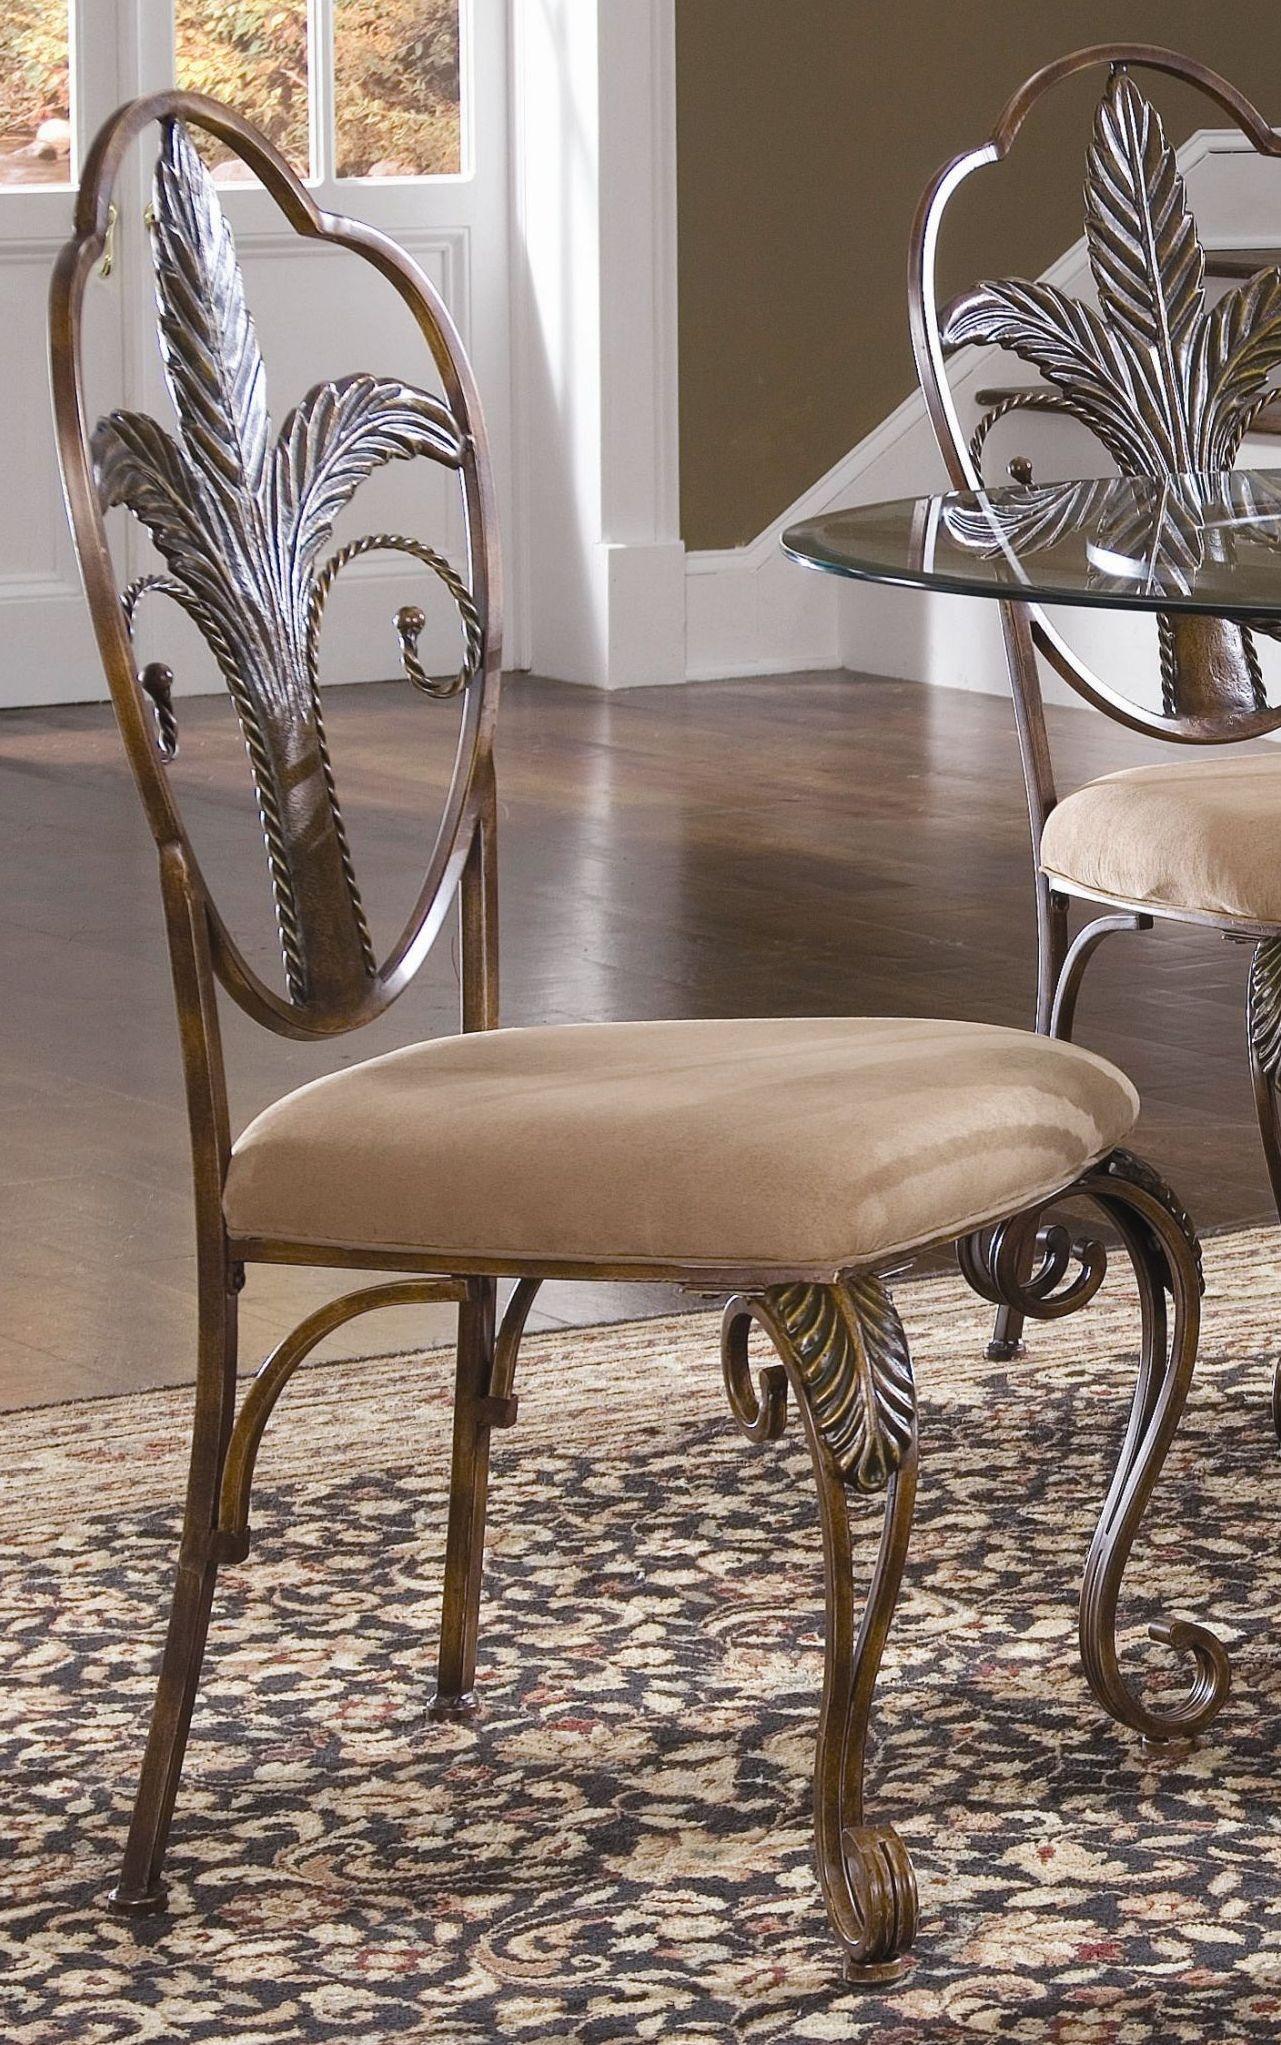 Largo International Dining Room Side Chair D1152 41